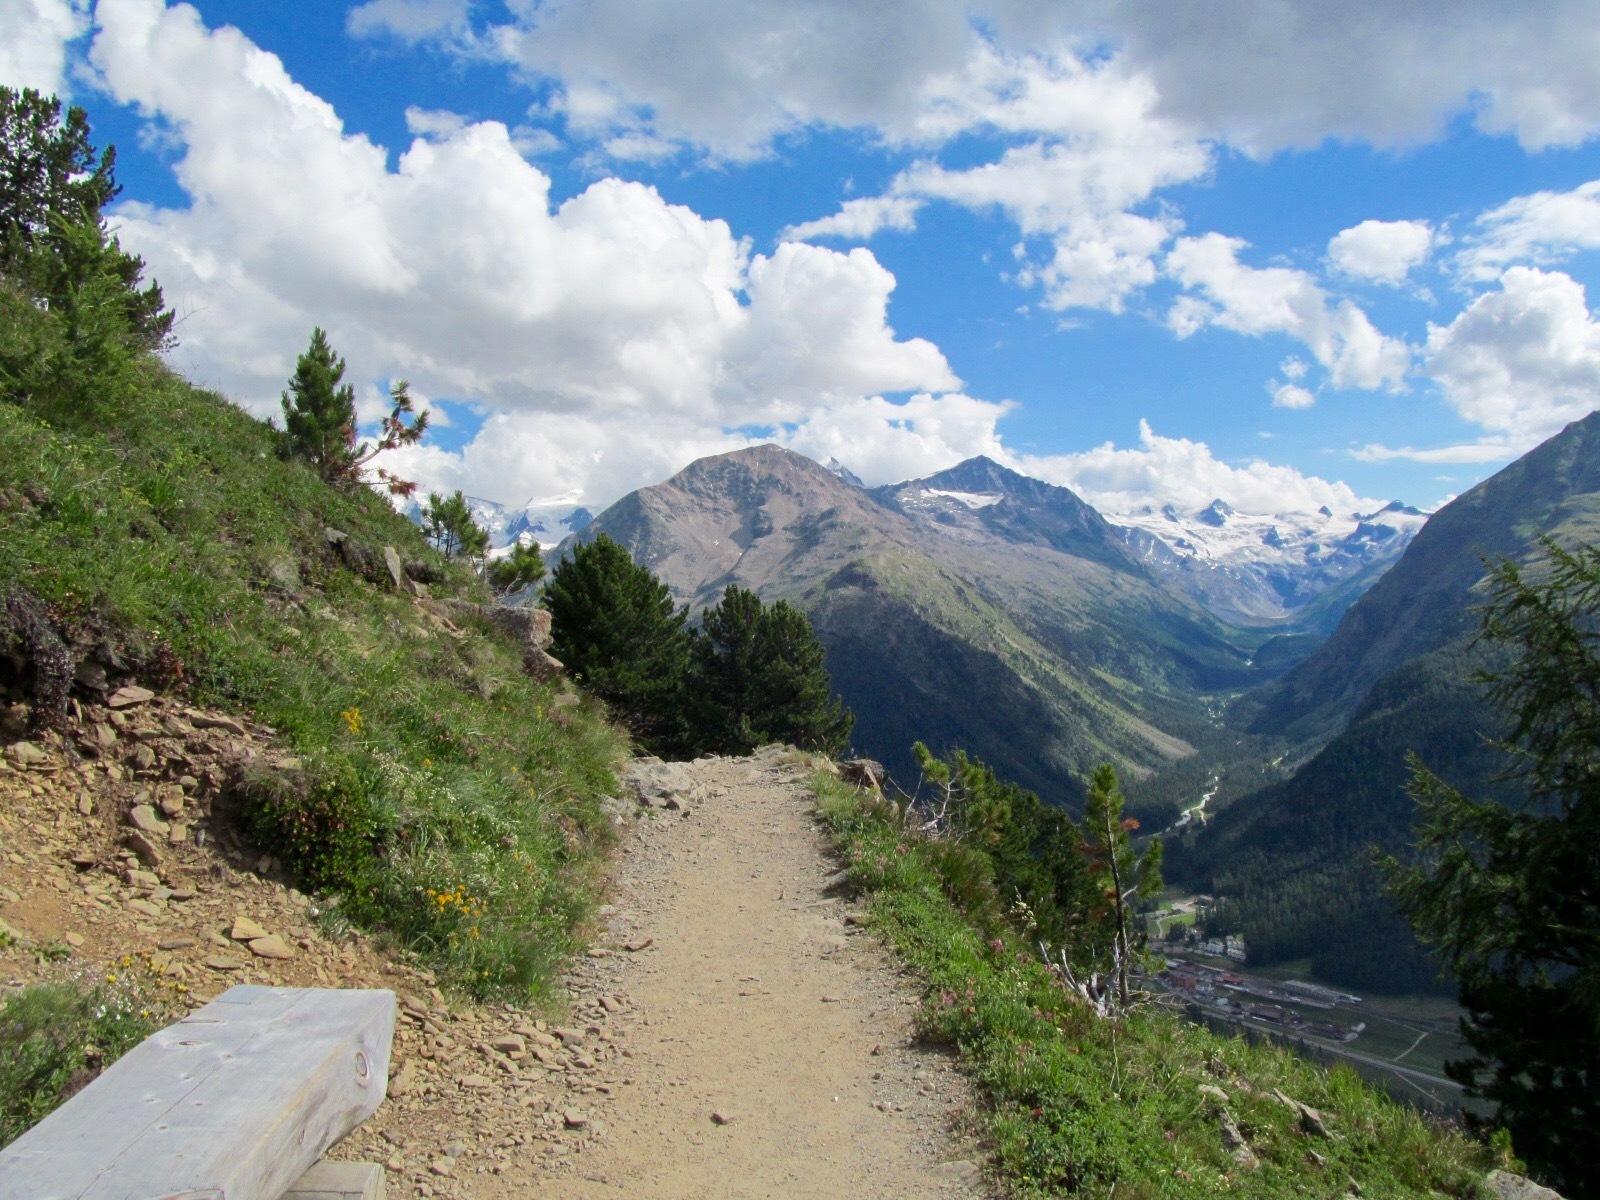 Sitzbänke Panoramaweg Muottas-Muragl - Alp Languard Slide 3